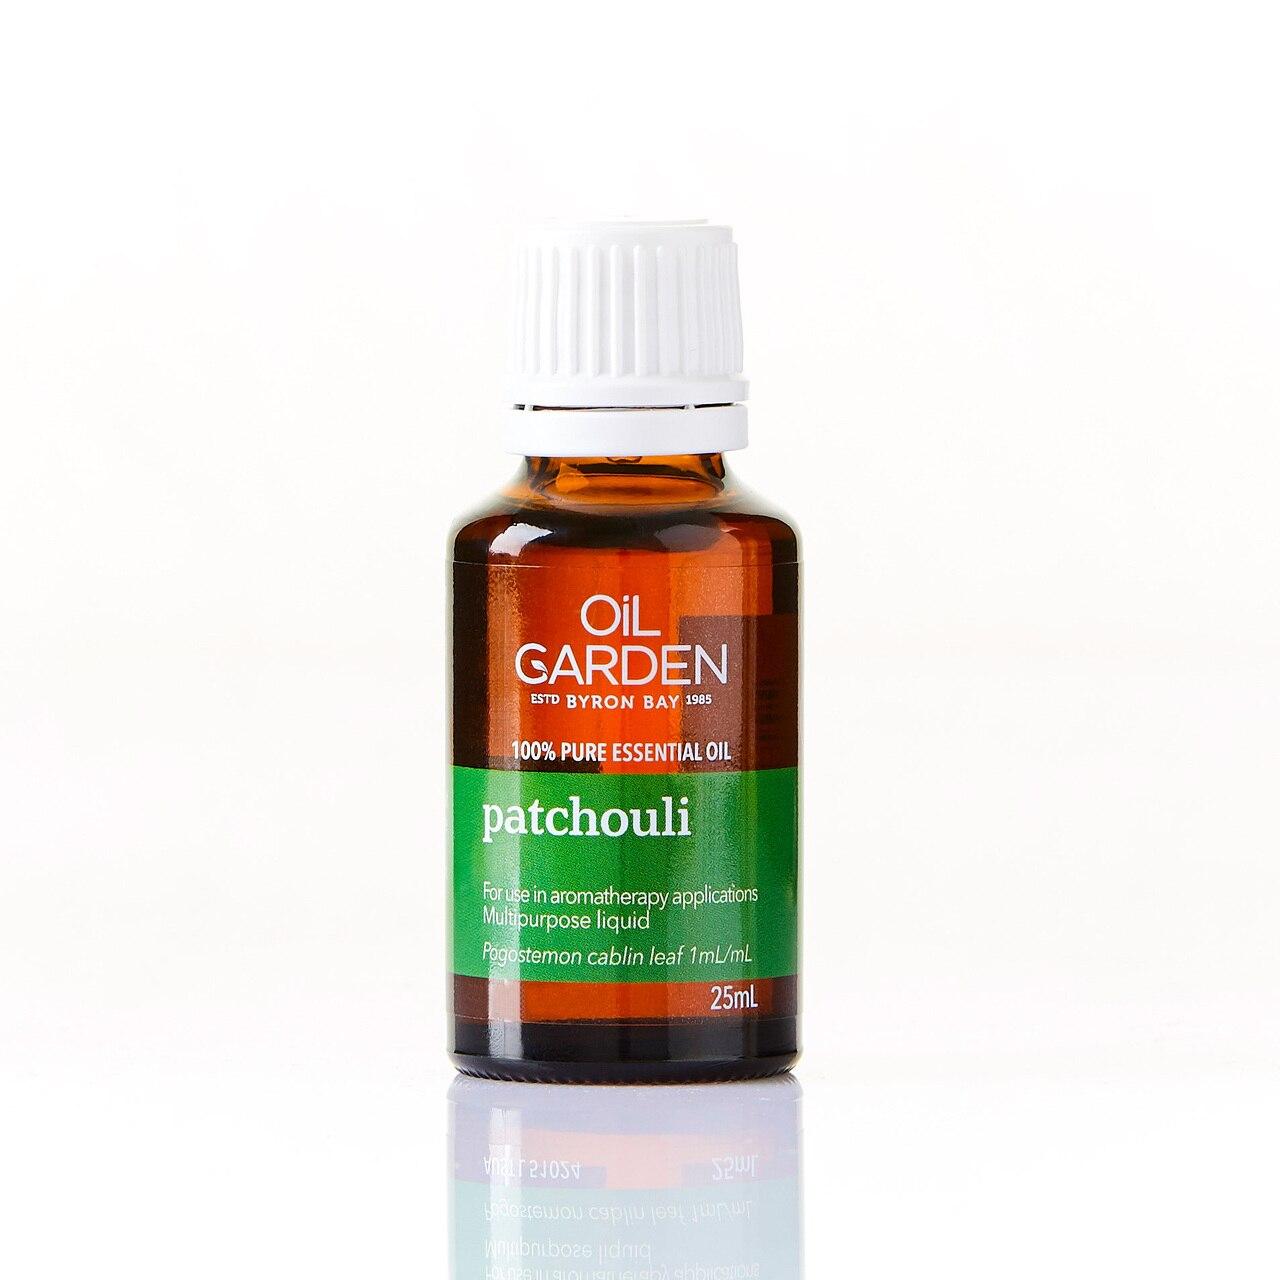 Oil Garden Patchouli Pure Essential Oil 25mL 6620077